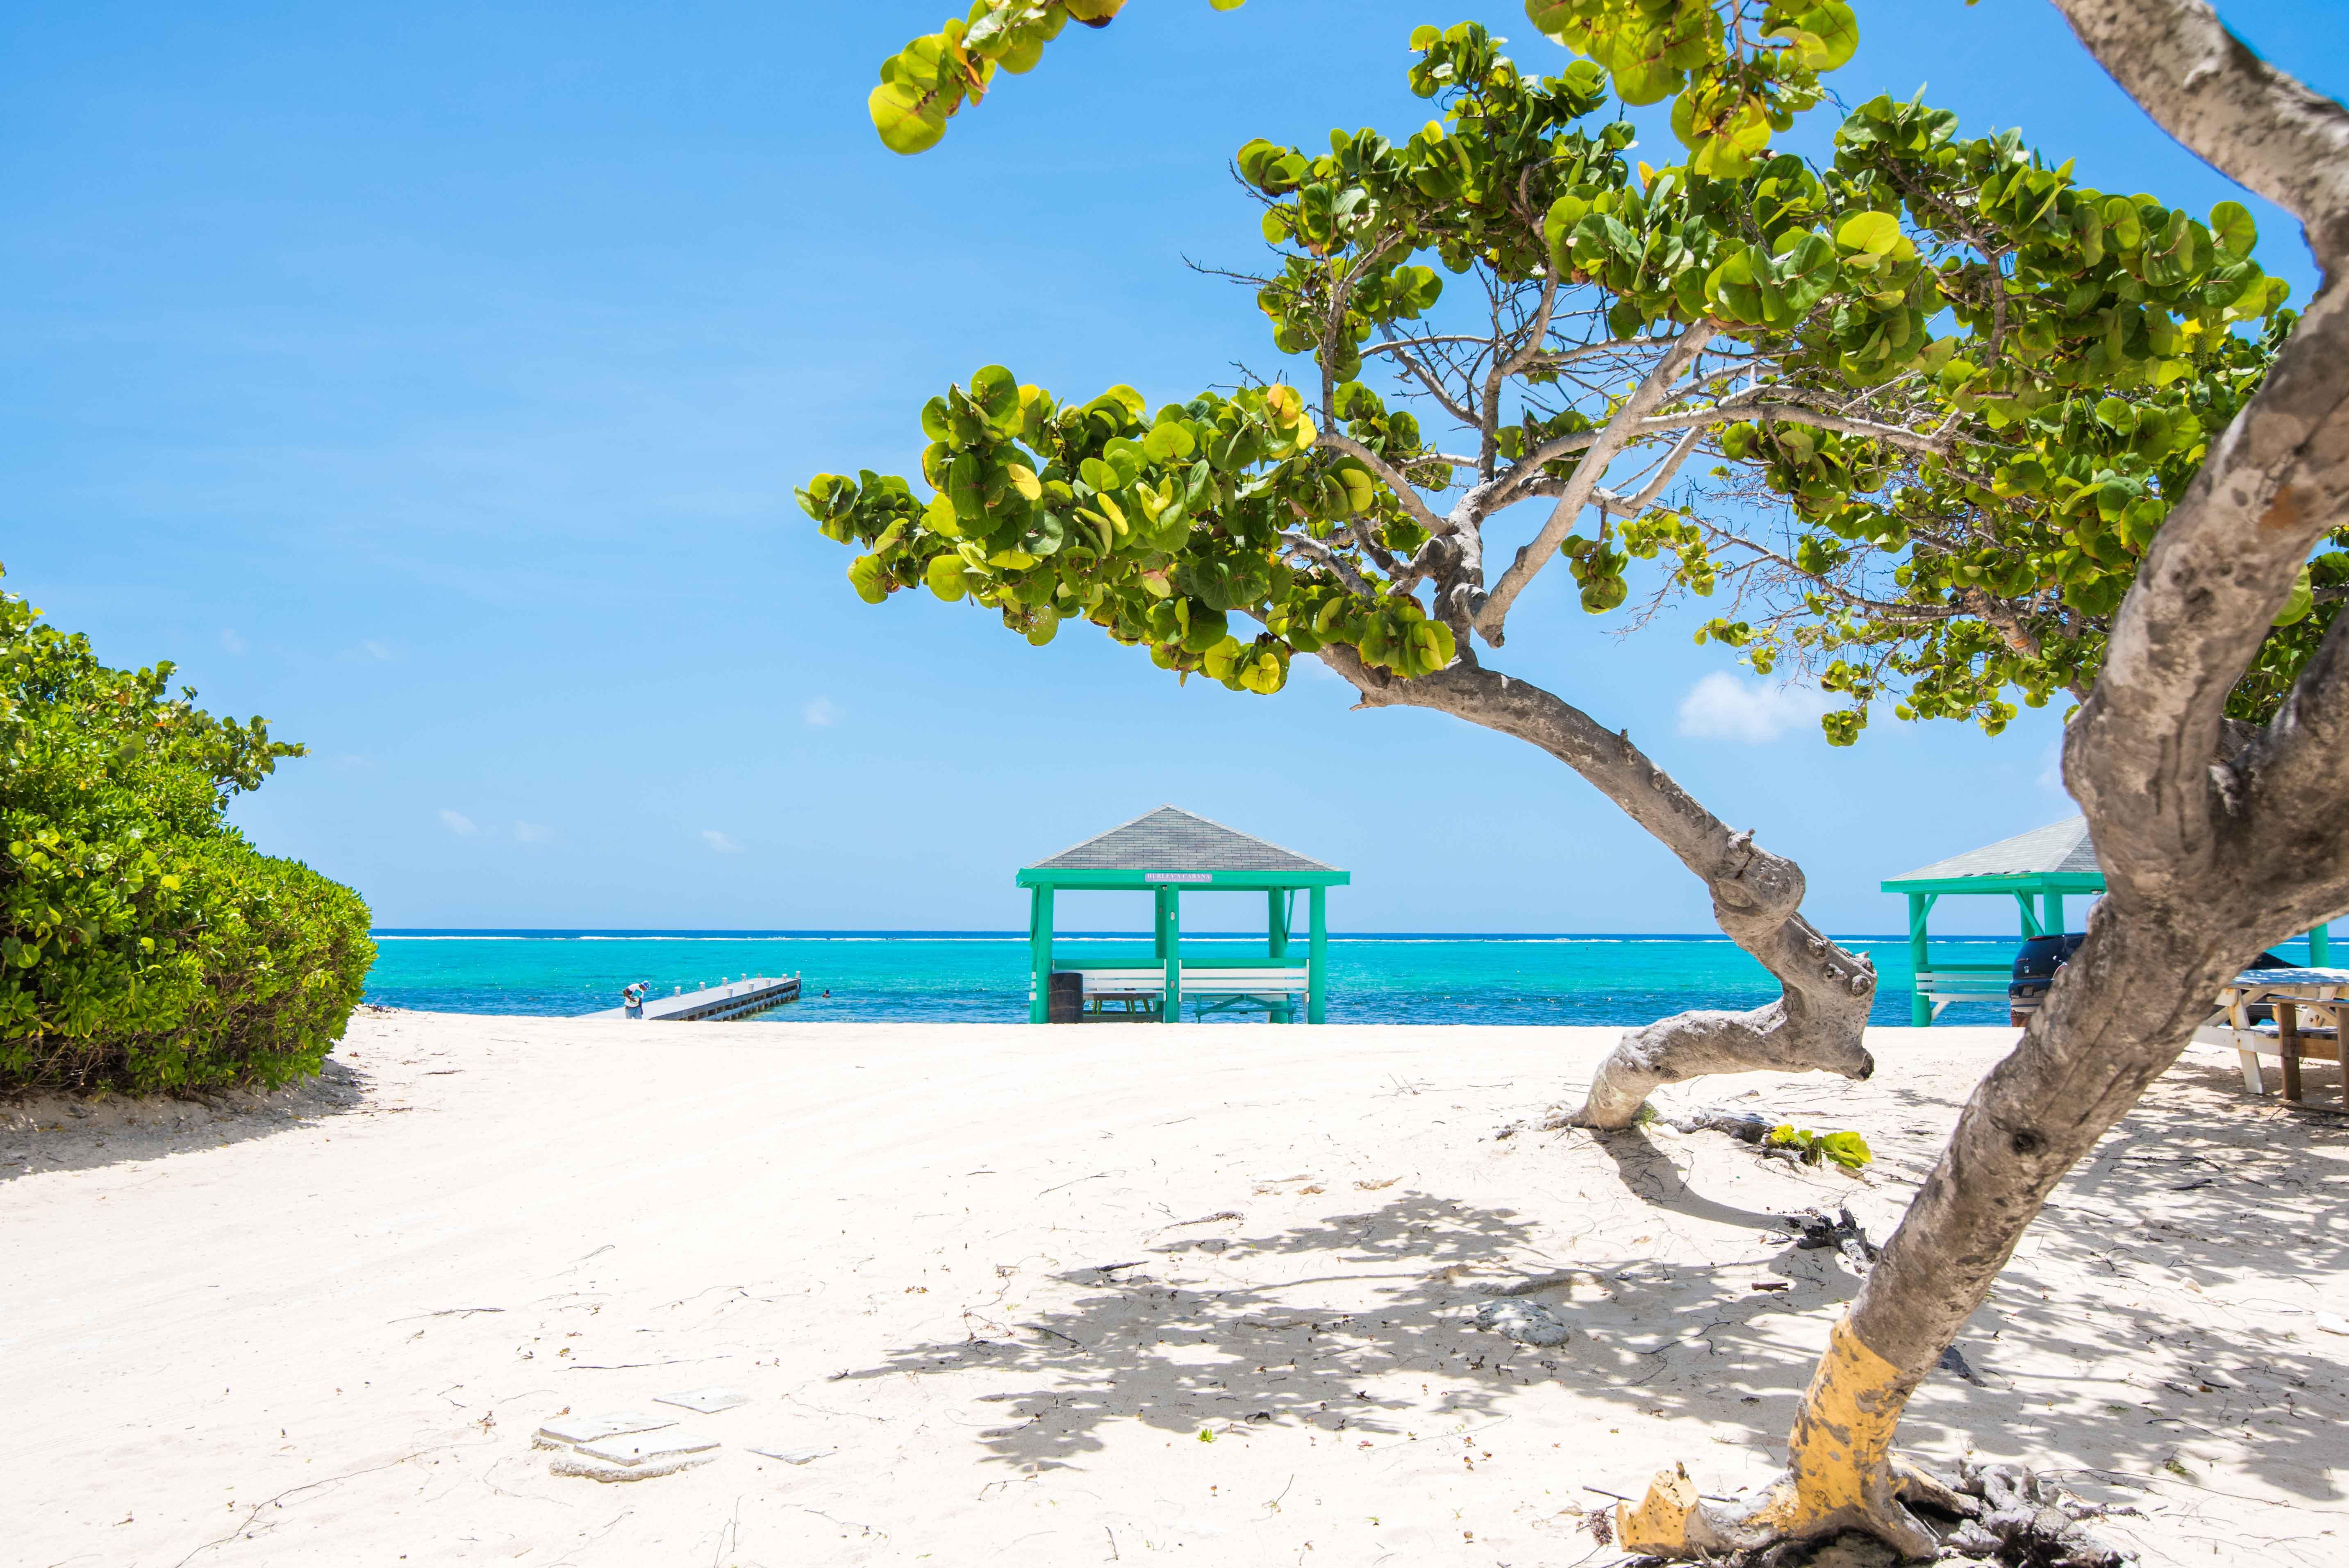 Grand Cayman online datingHur man skriver en perfekt online dating profil